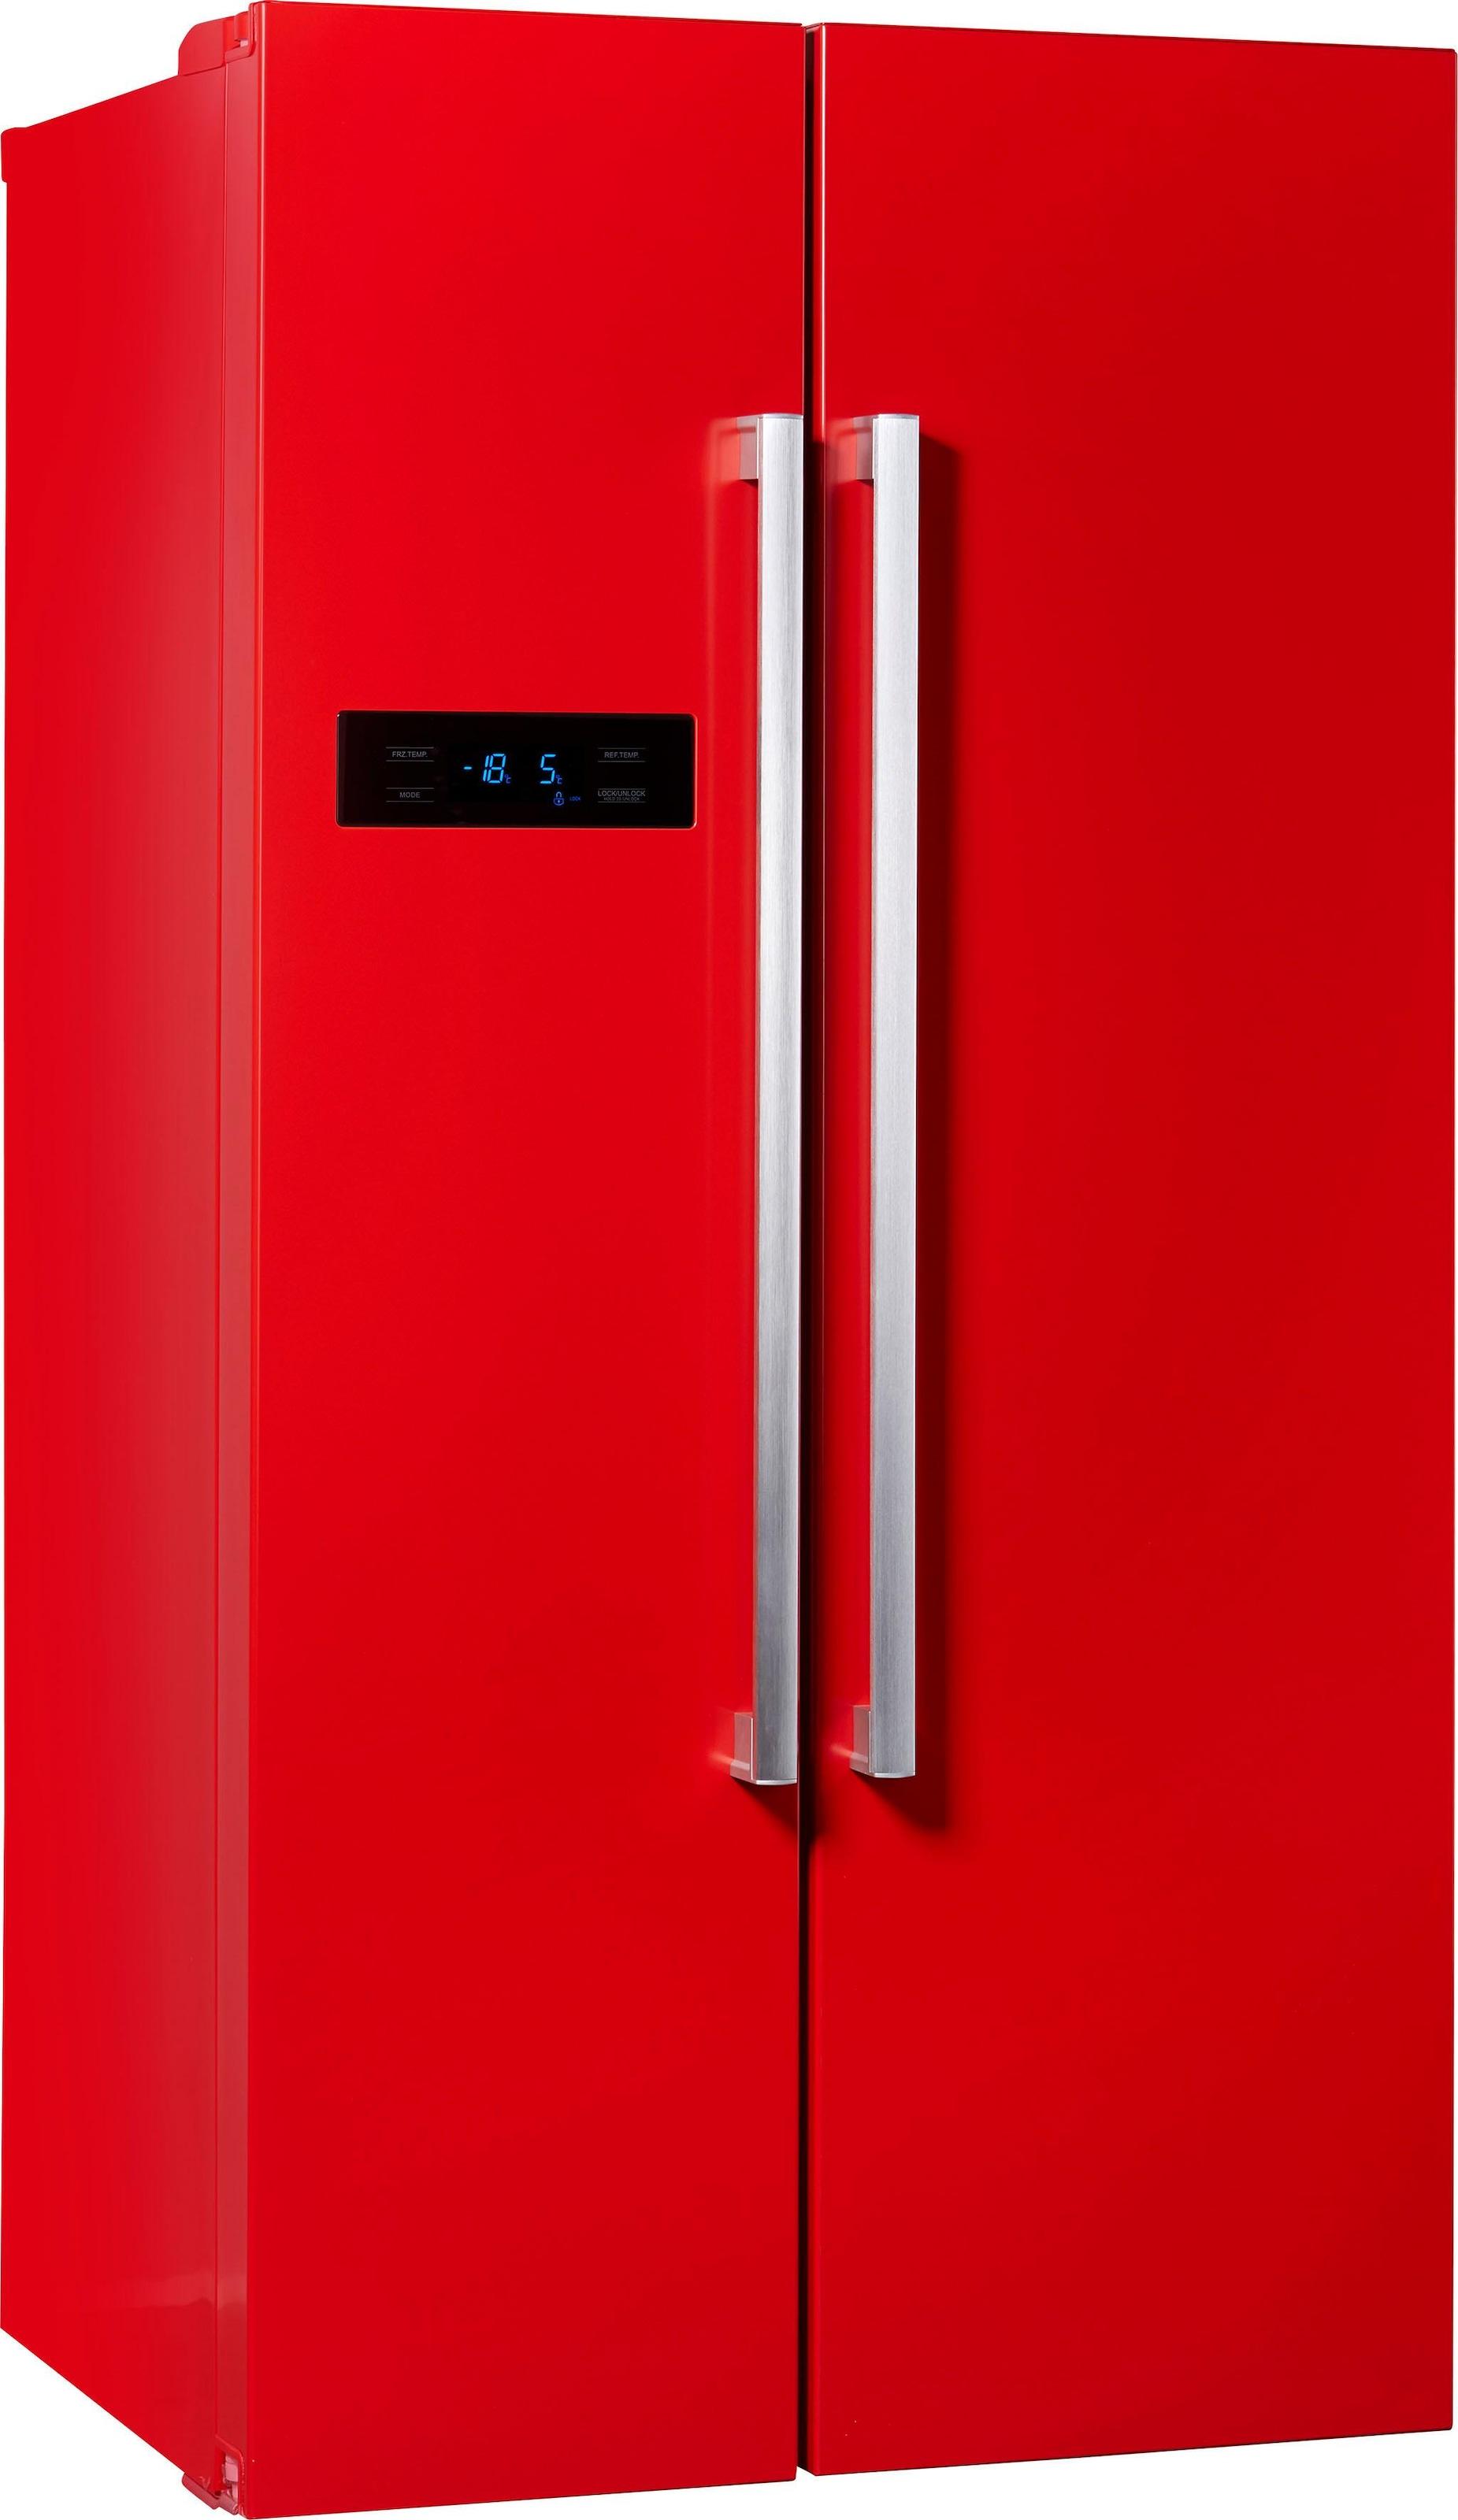 Bosch Kühlschrank Side By Side Schwarz : Bosch side by side kühlschrank schön tolle nofrost kühlschrank